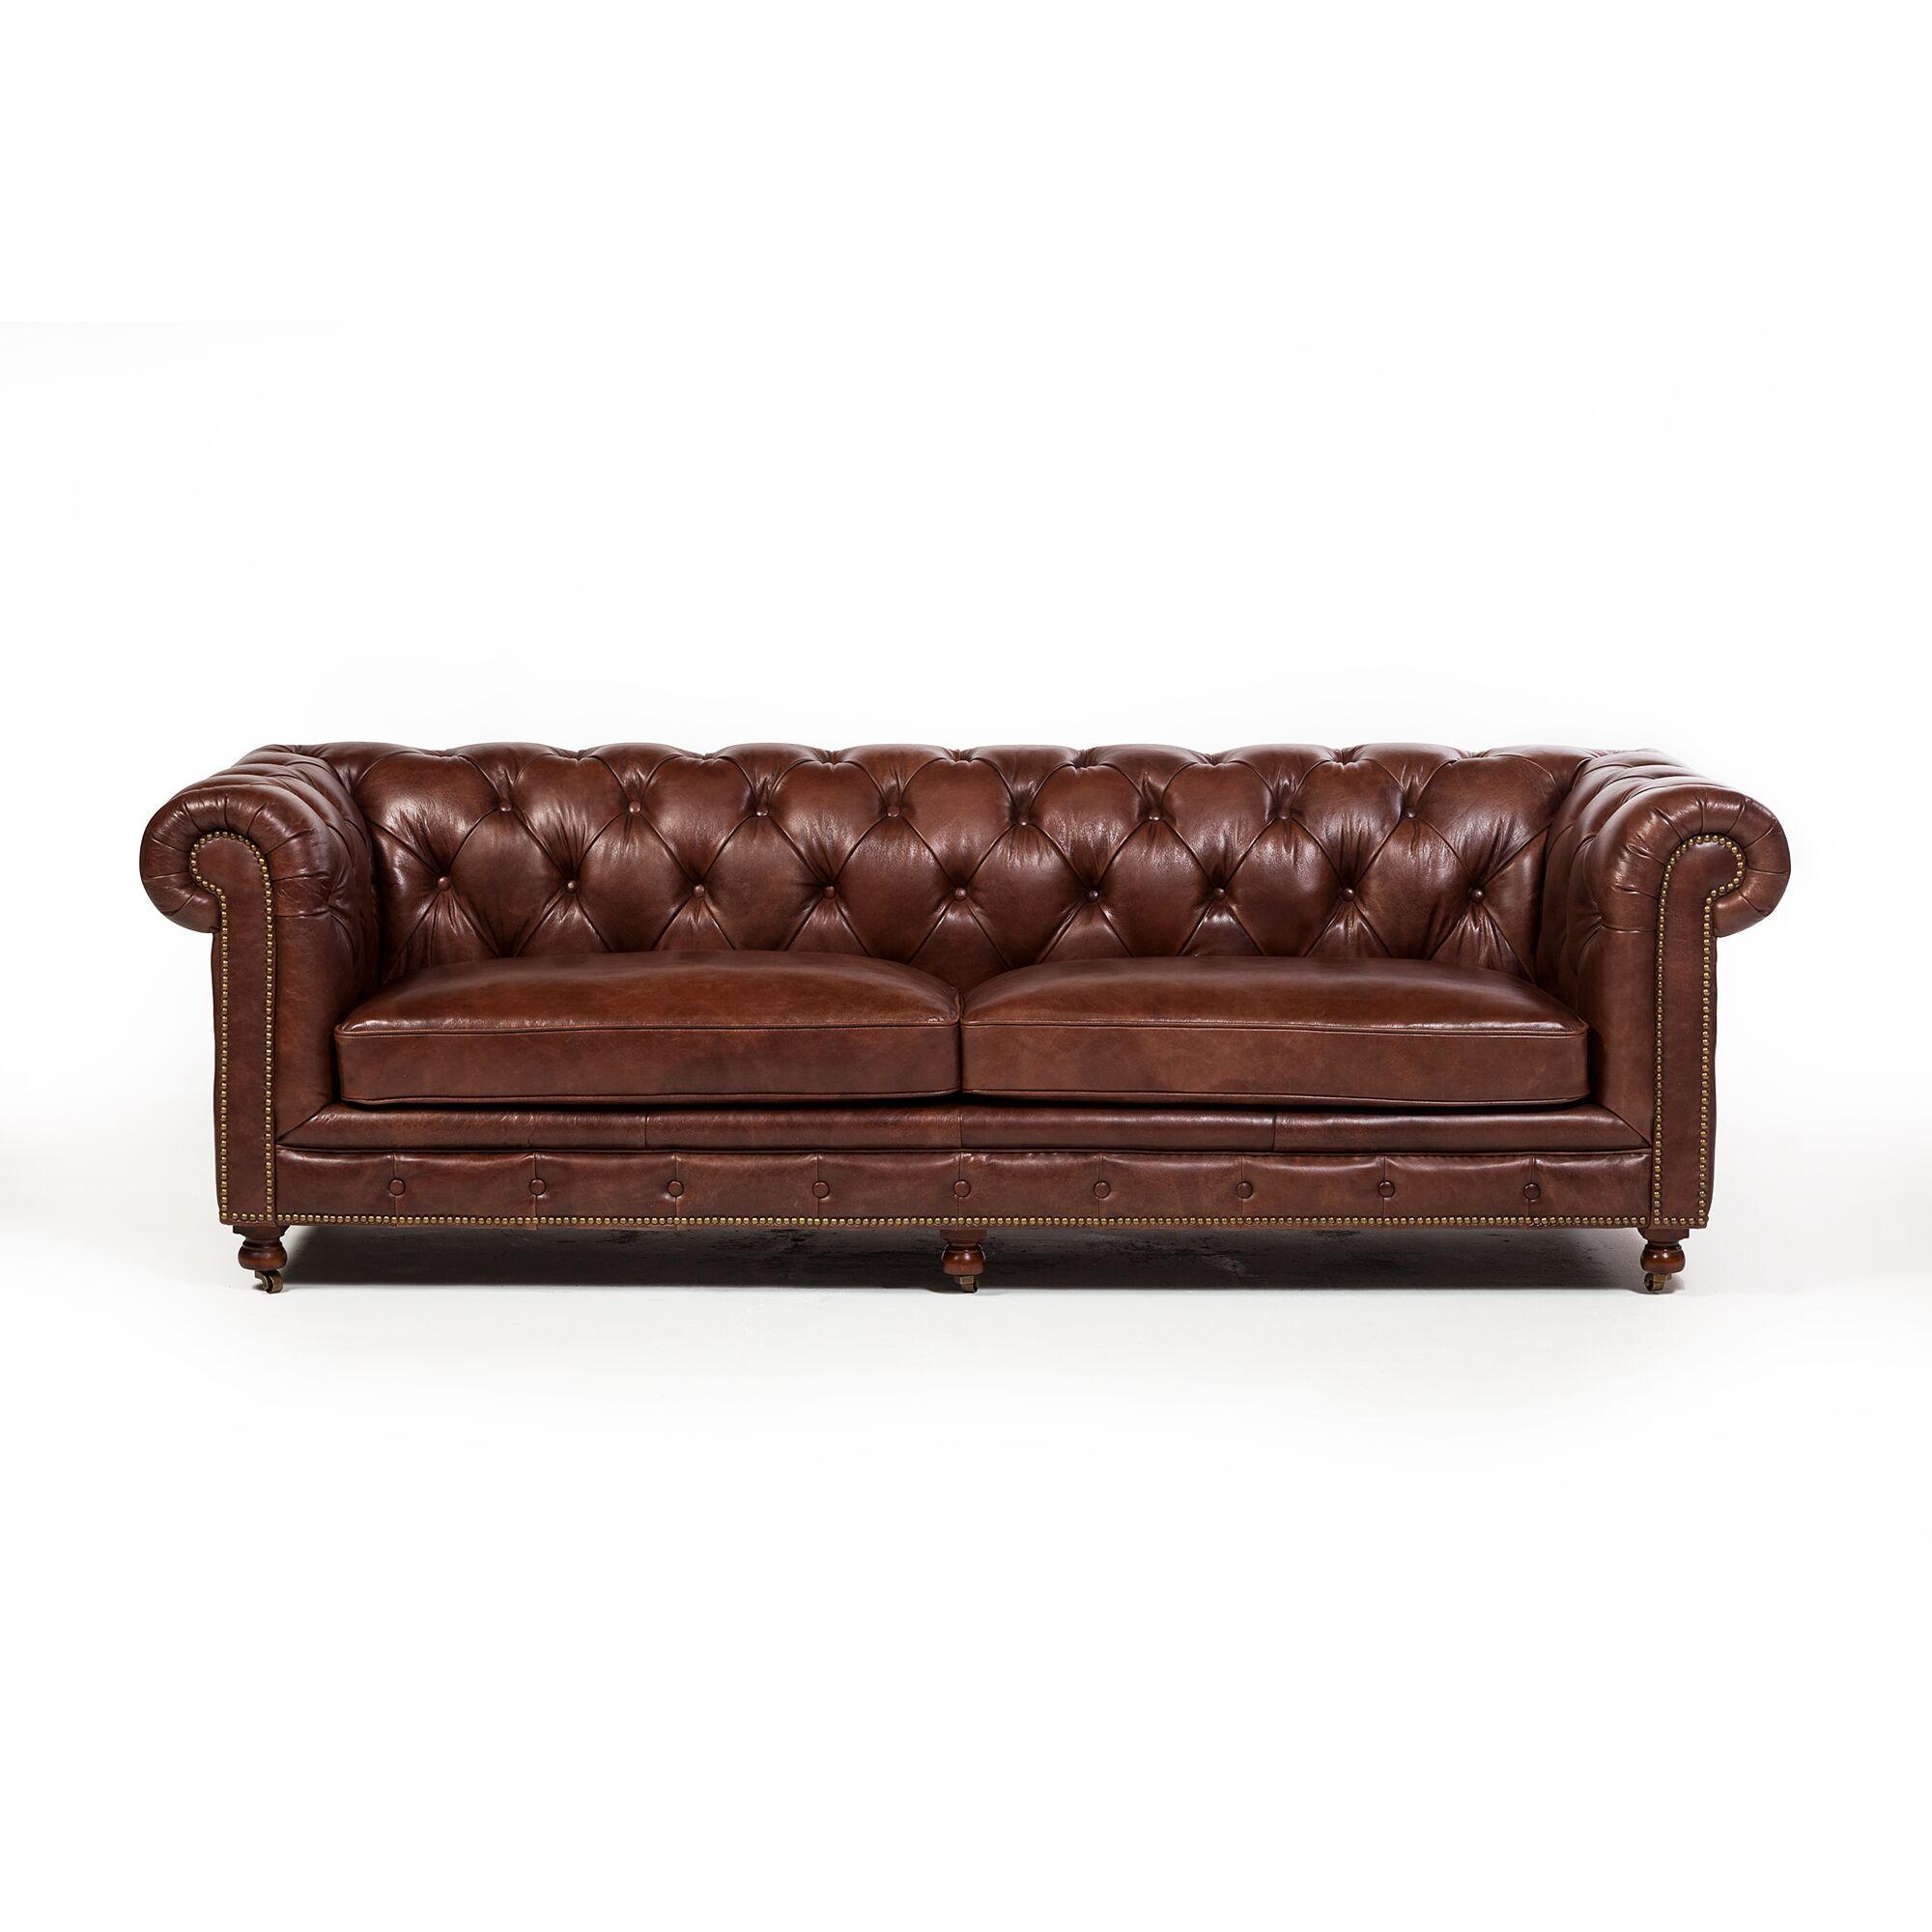 Atkins Chesterfield Sofa